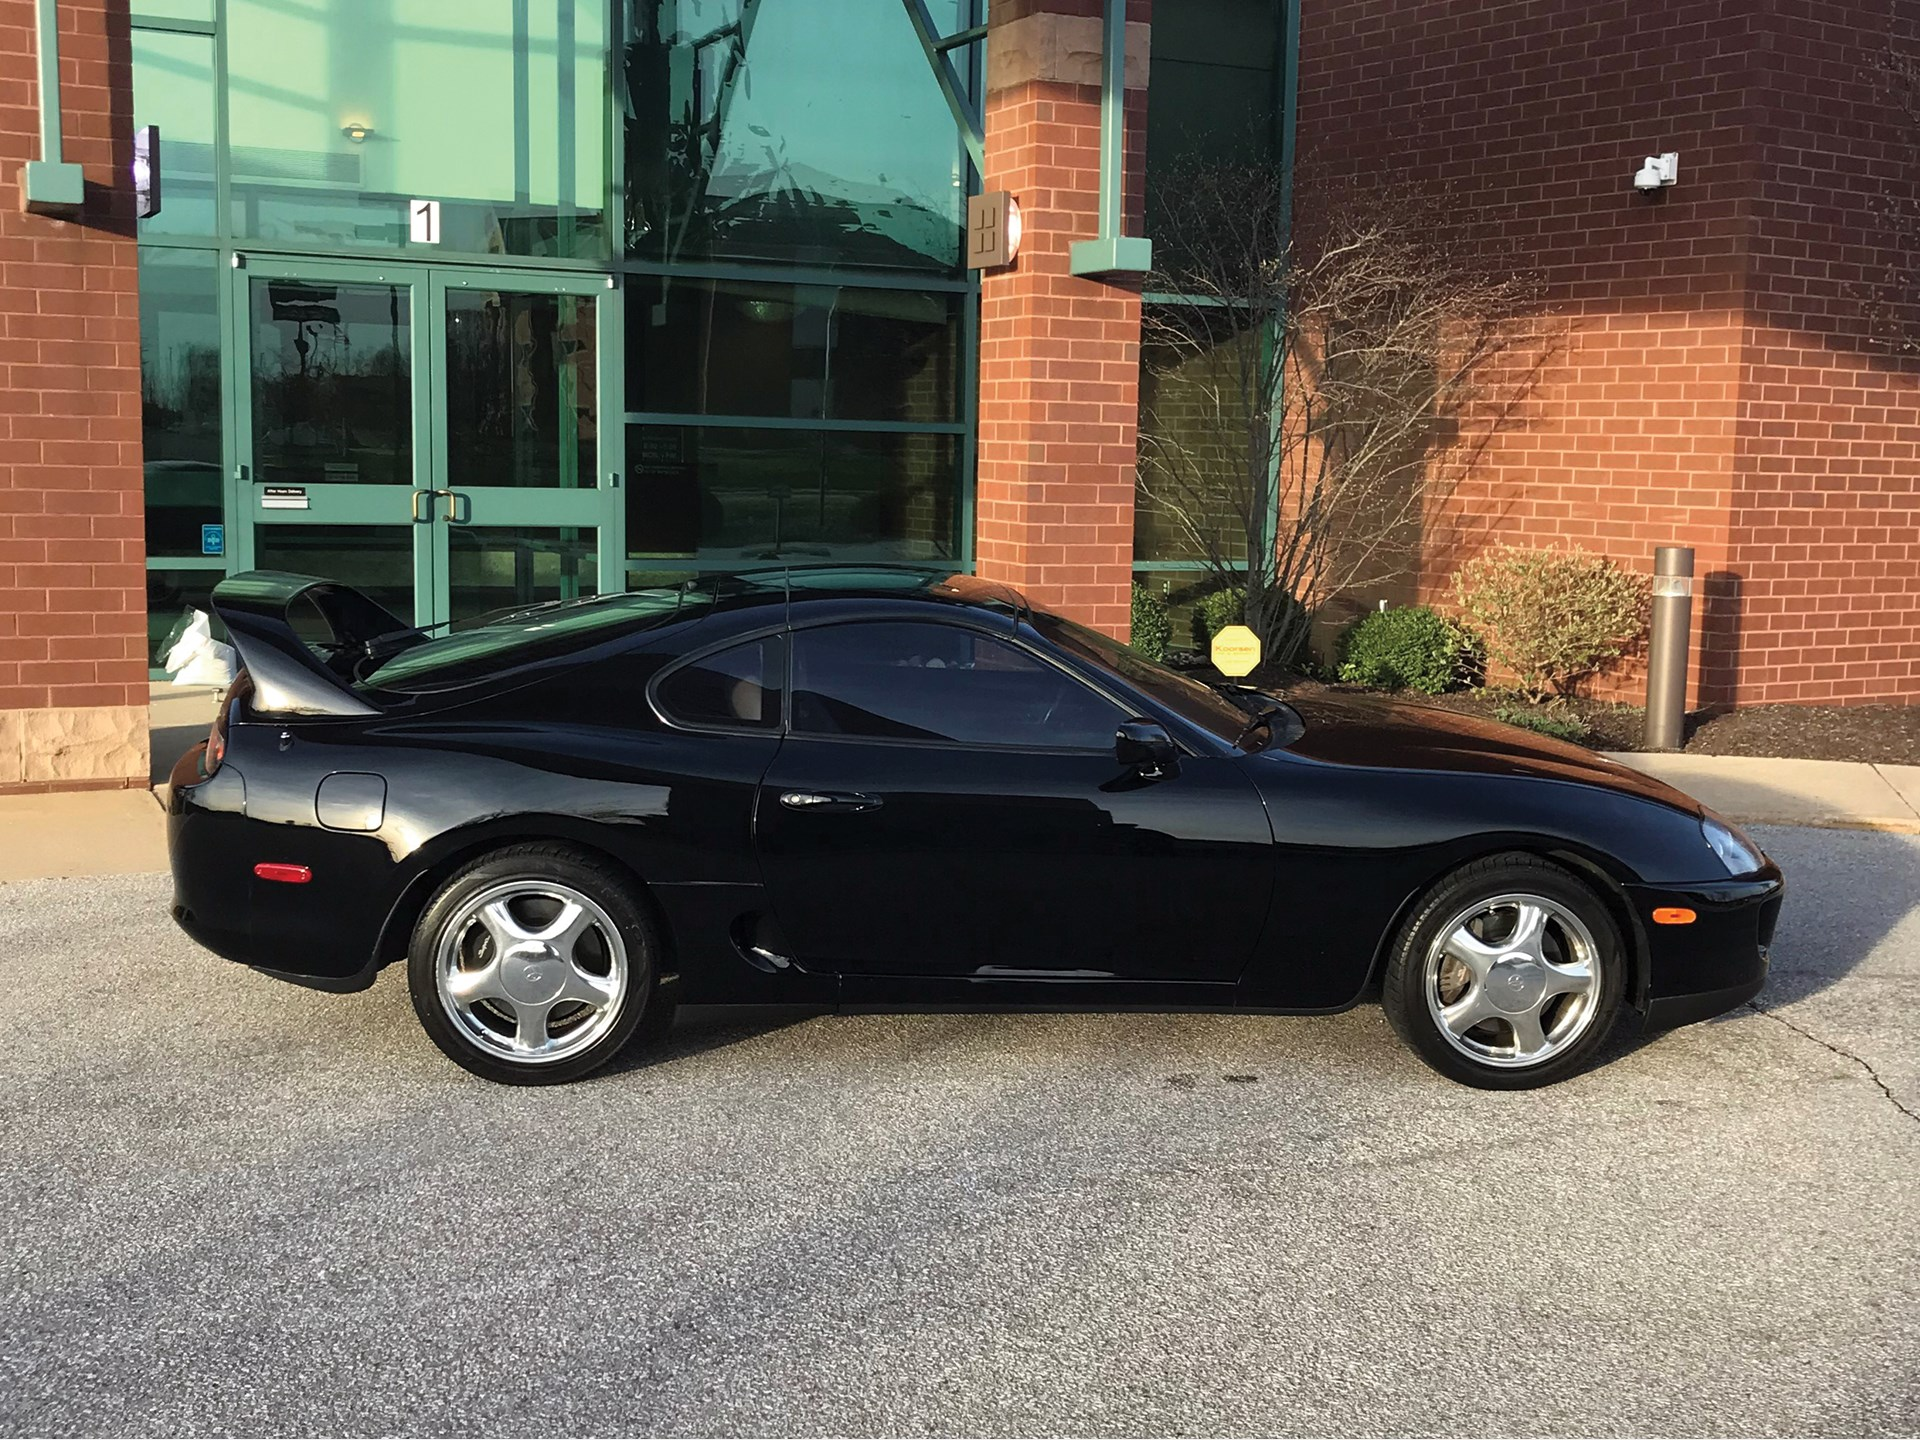 RM Sotheby's - 1994 Toyota Supra Twin Turbo Targa | Auburn Spring 2019